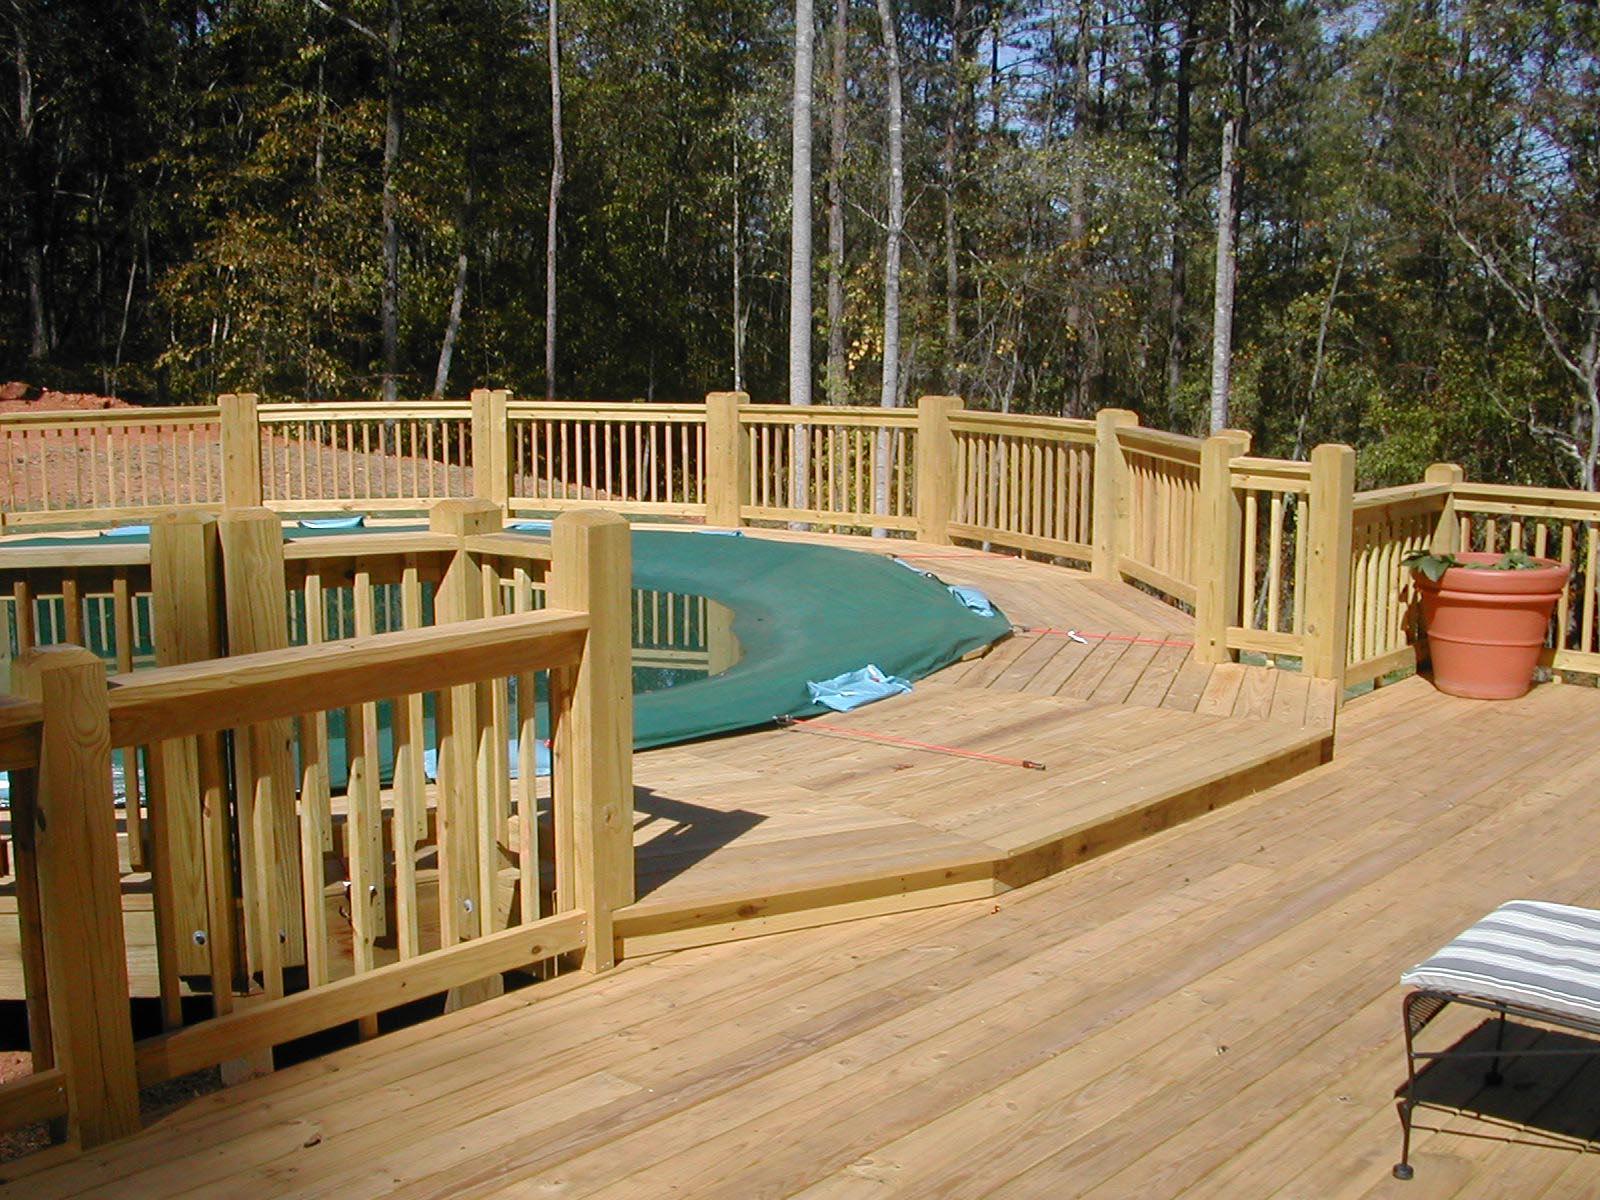 Swimming Pool With Deck | Backyard Design Ideas on Pool Deck Patio Ideas  id=58529